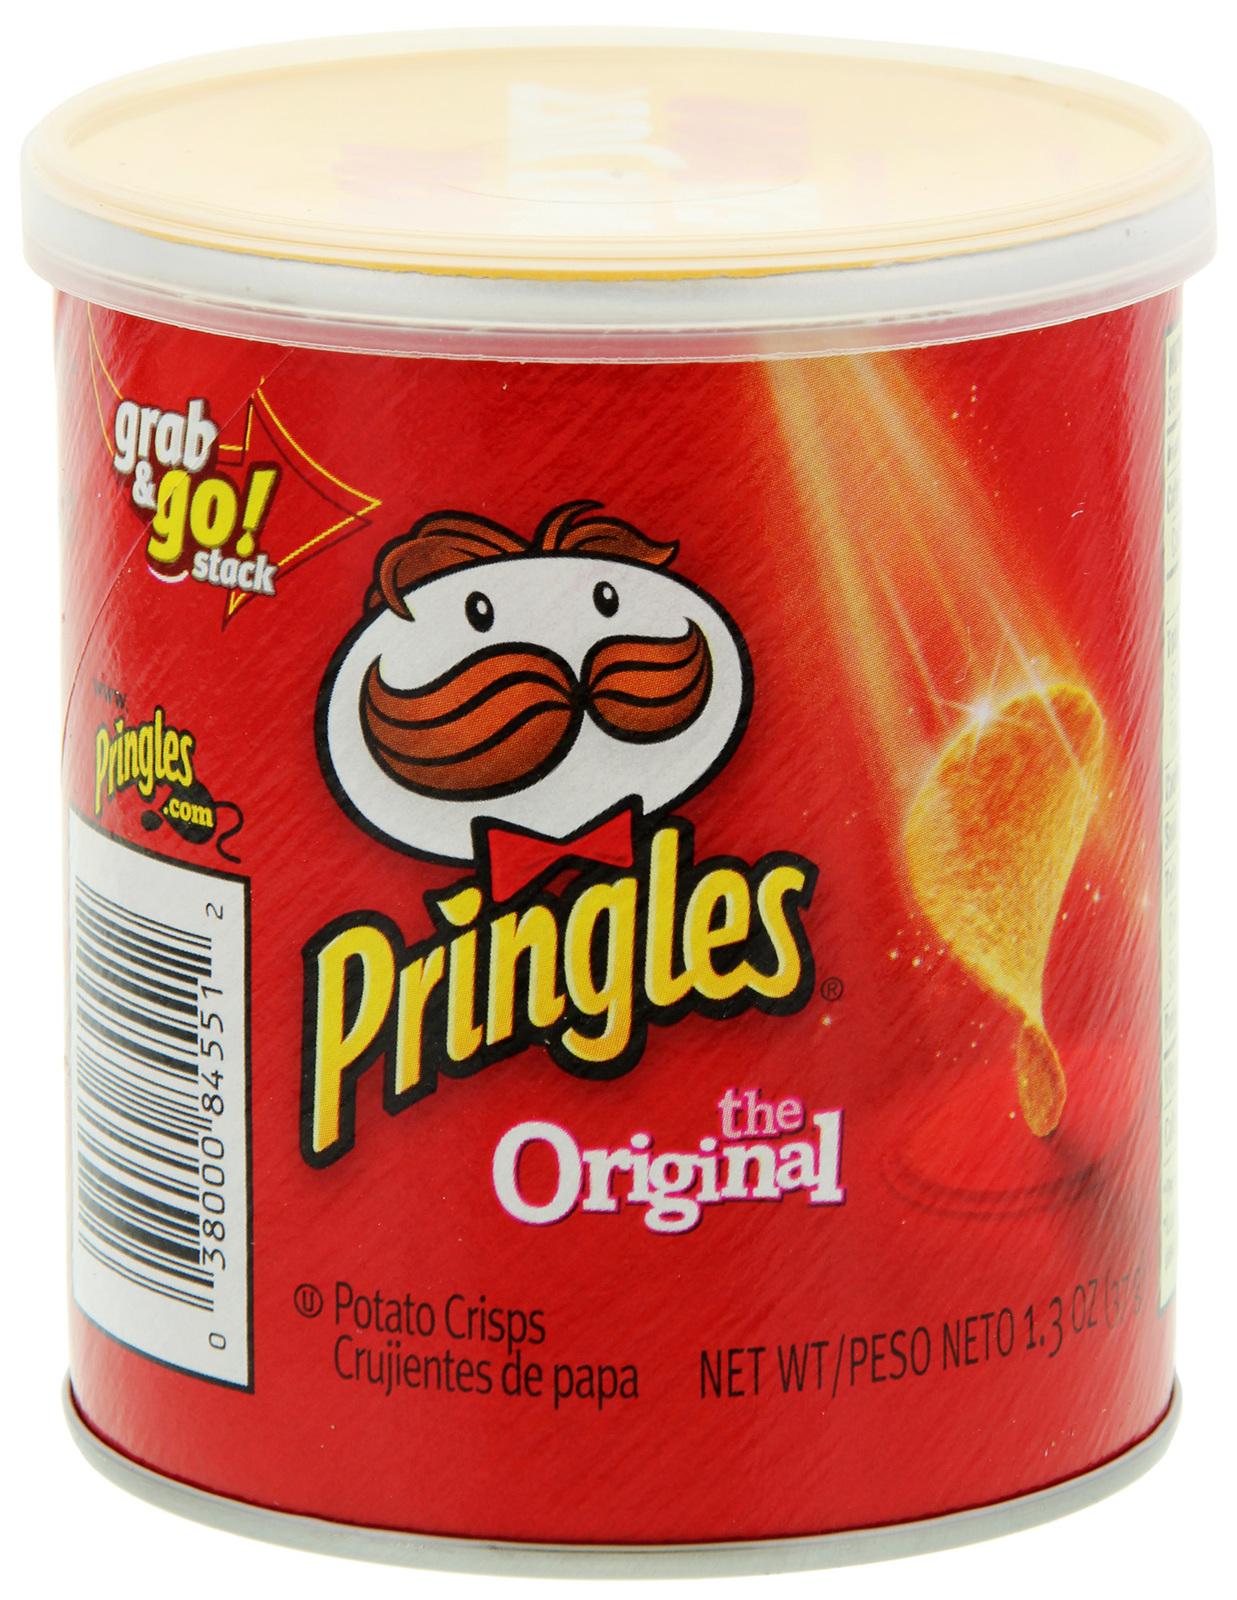 Pringles Grab & Go Small Original 37g (12 Pack) image